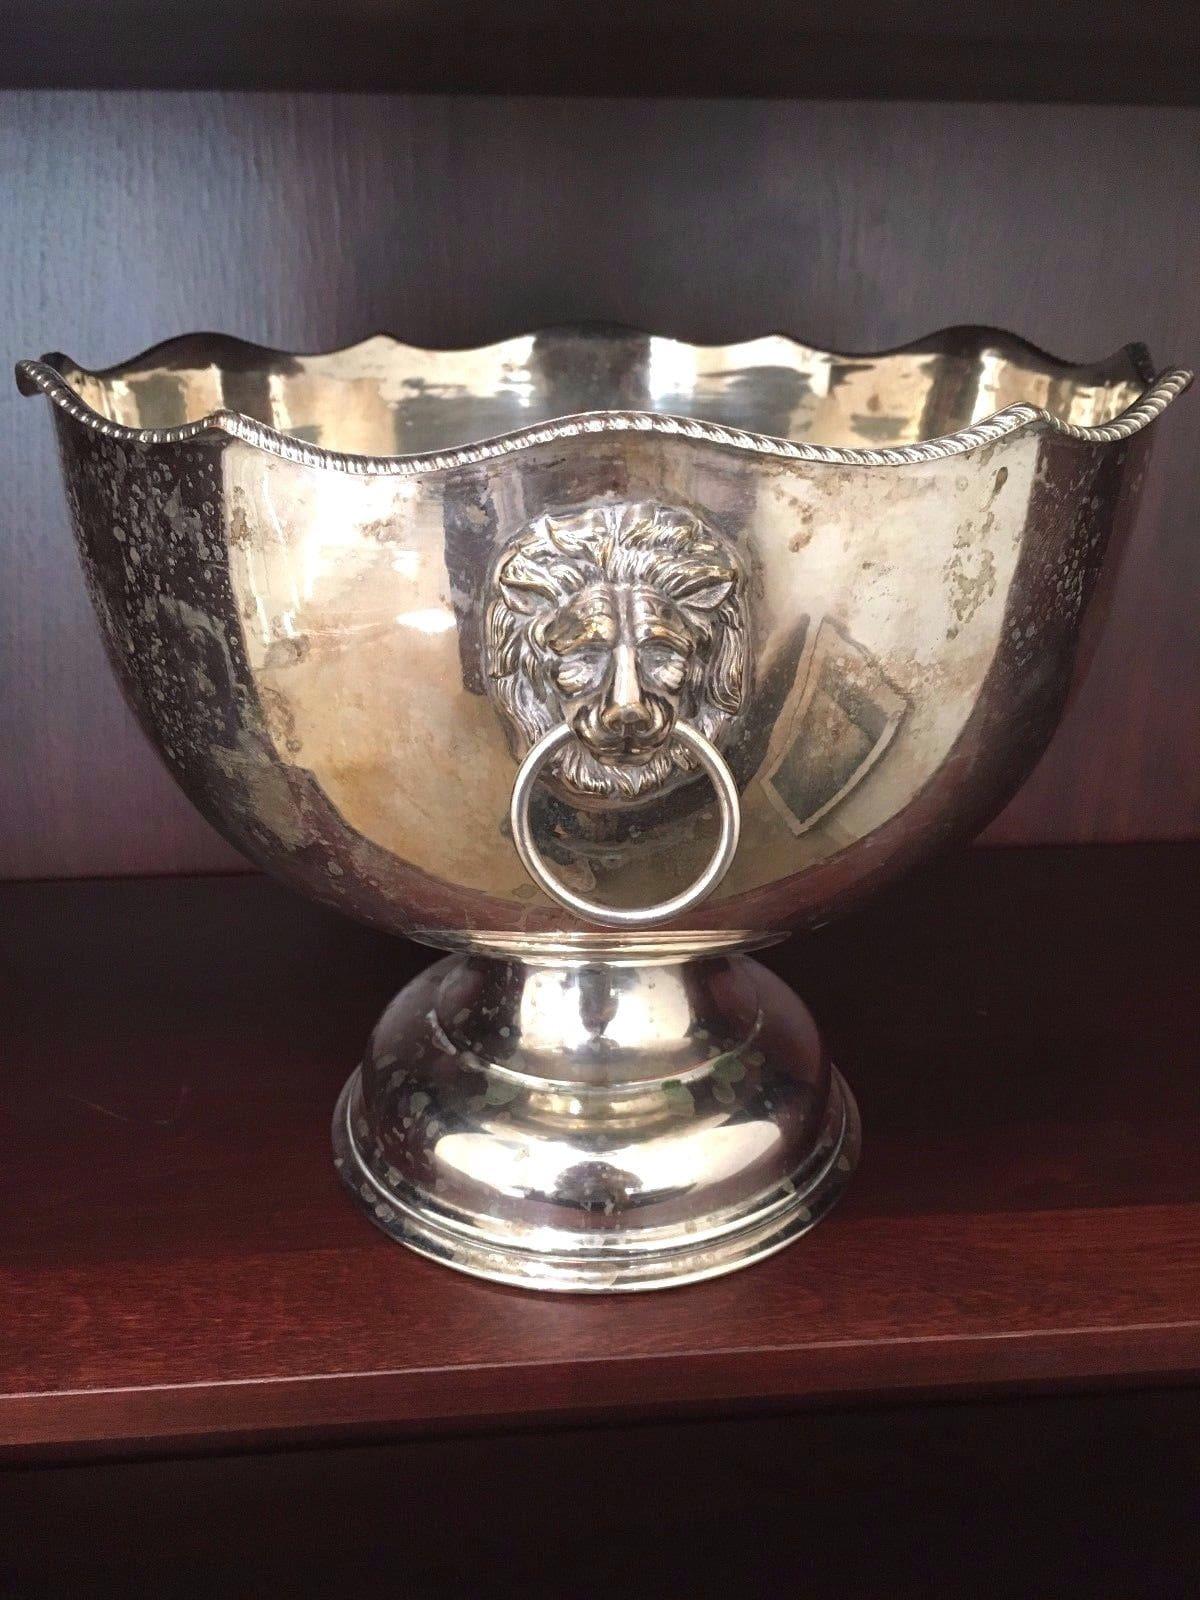 Vintage Punch Bowl - Silver on Copper - Ornate Lion's Head Handles